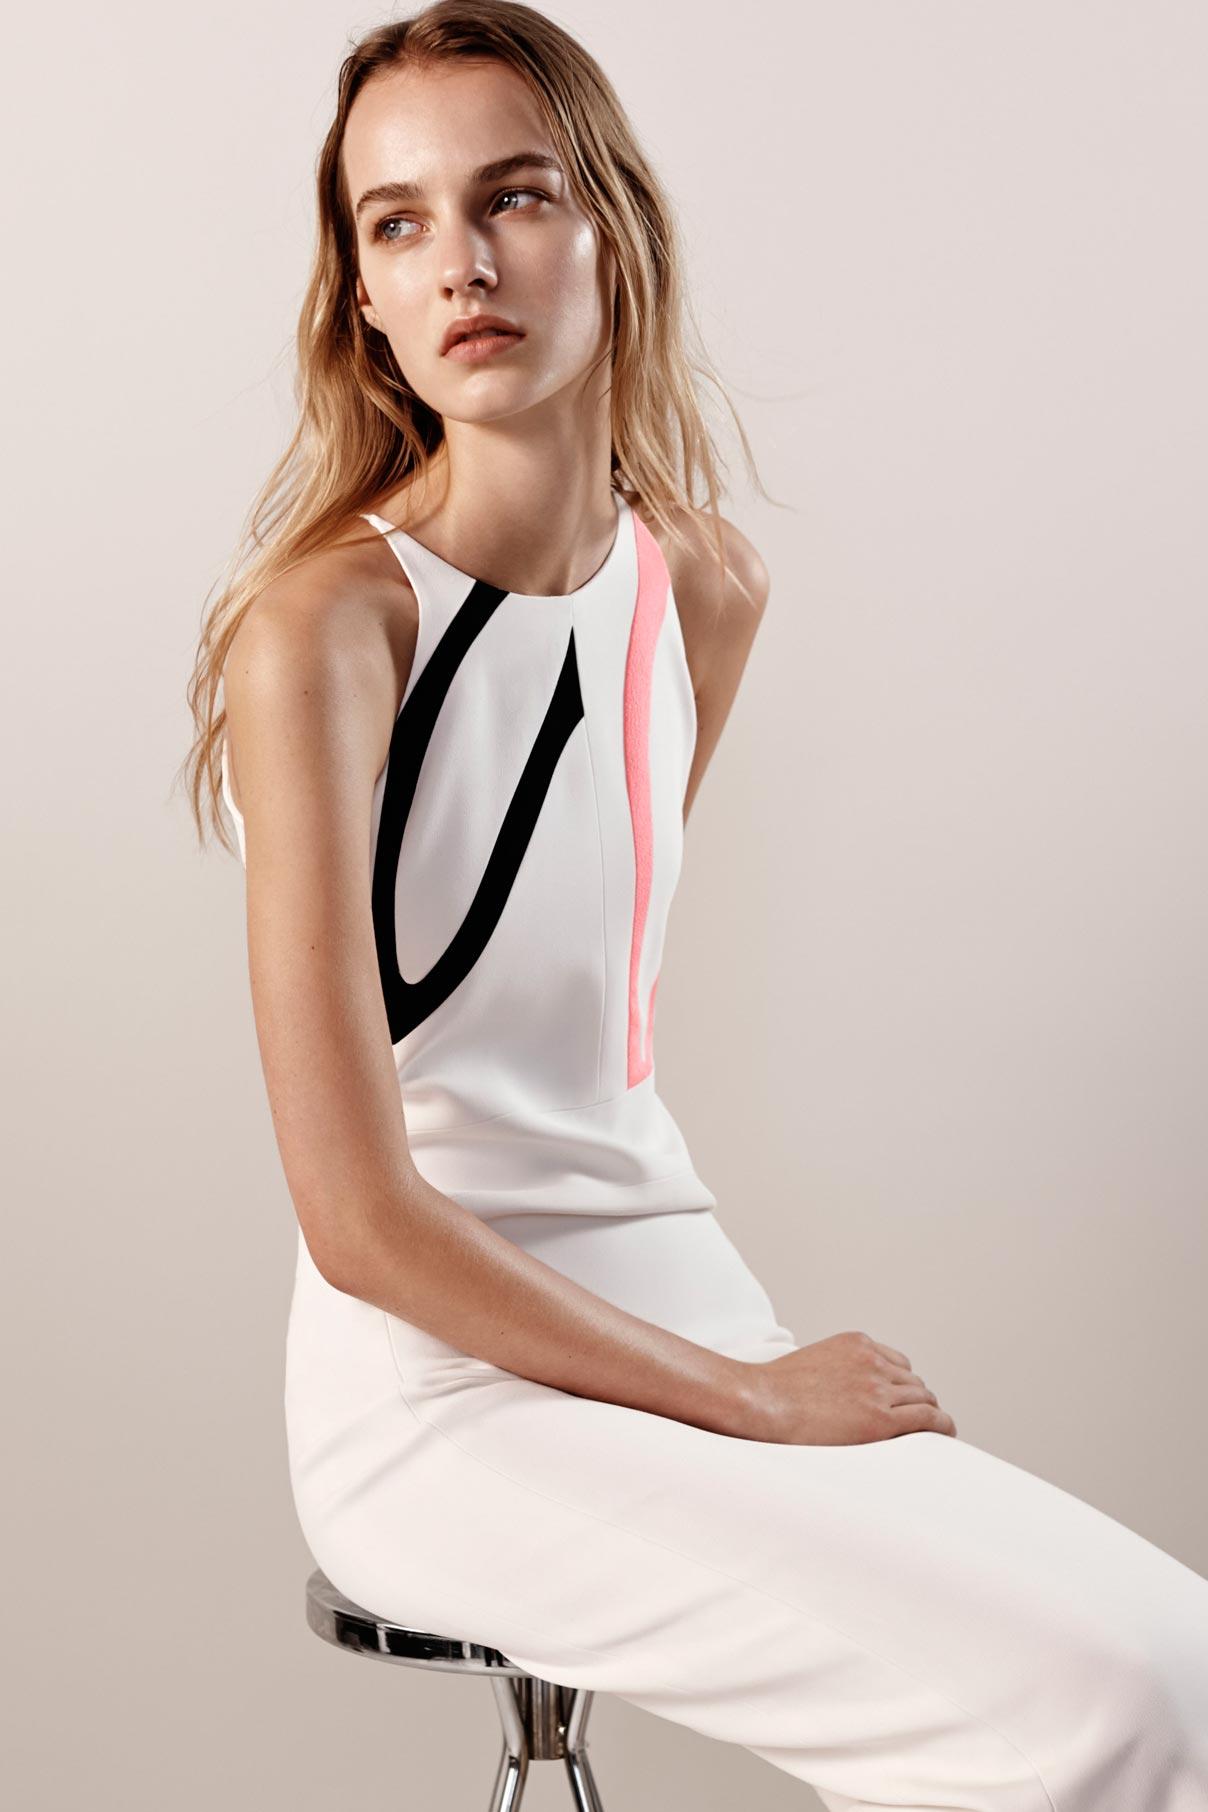 Look 10 White/black/pink viscose crepe graphic dress.